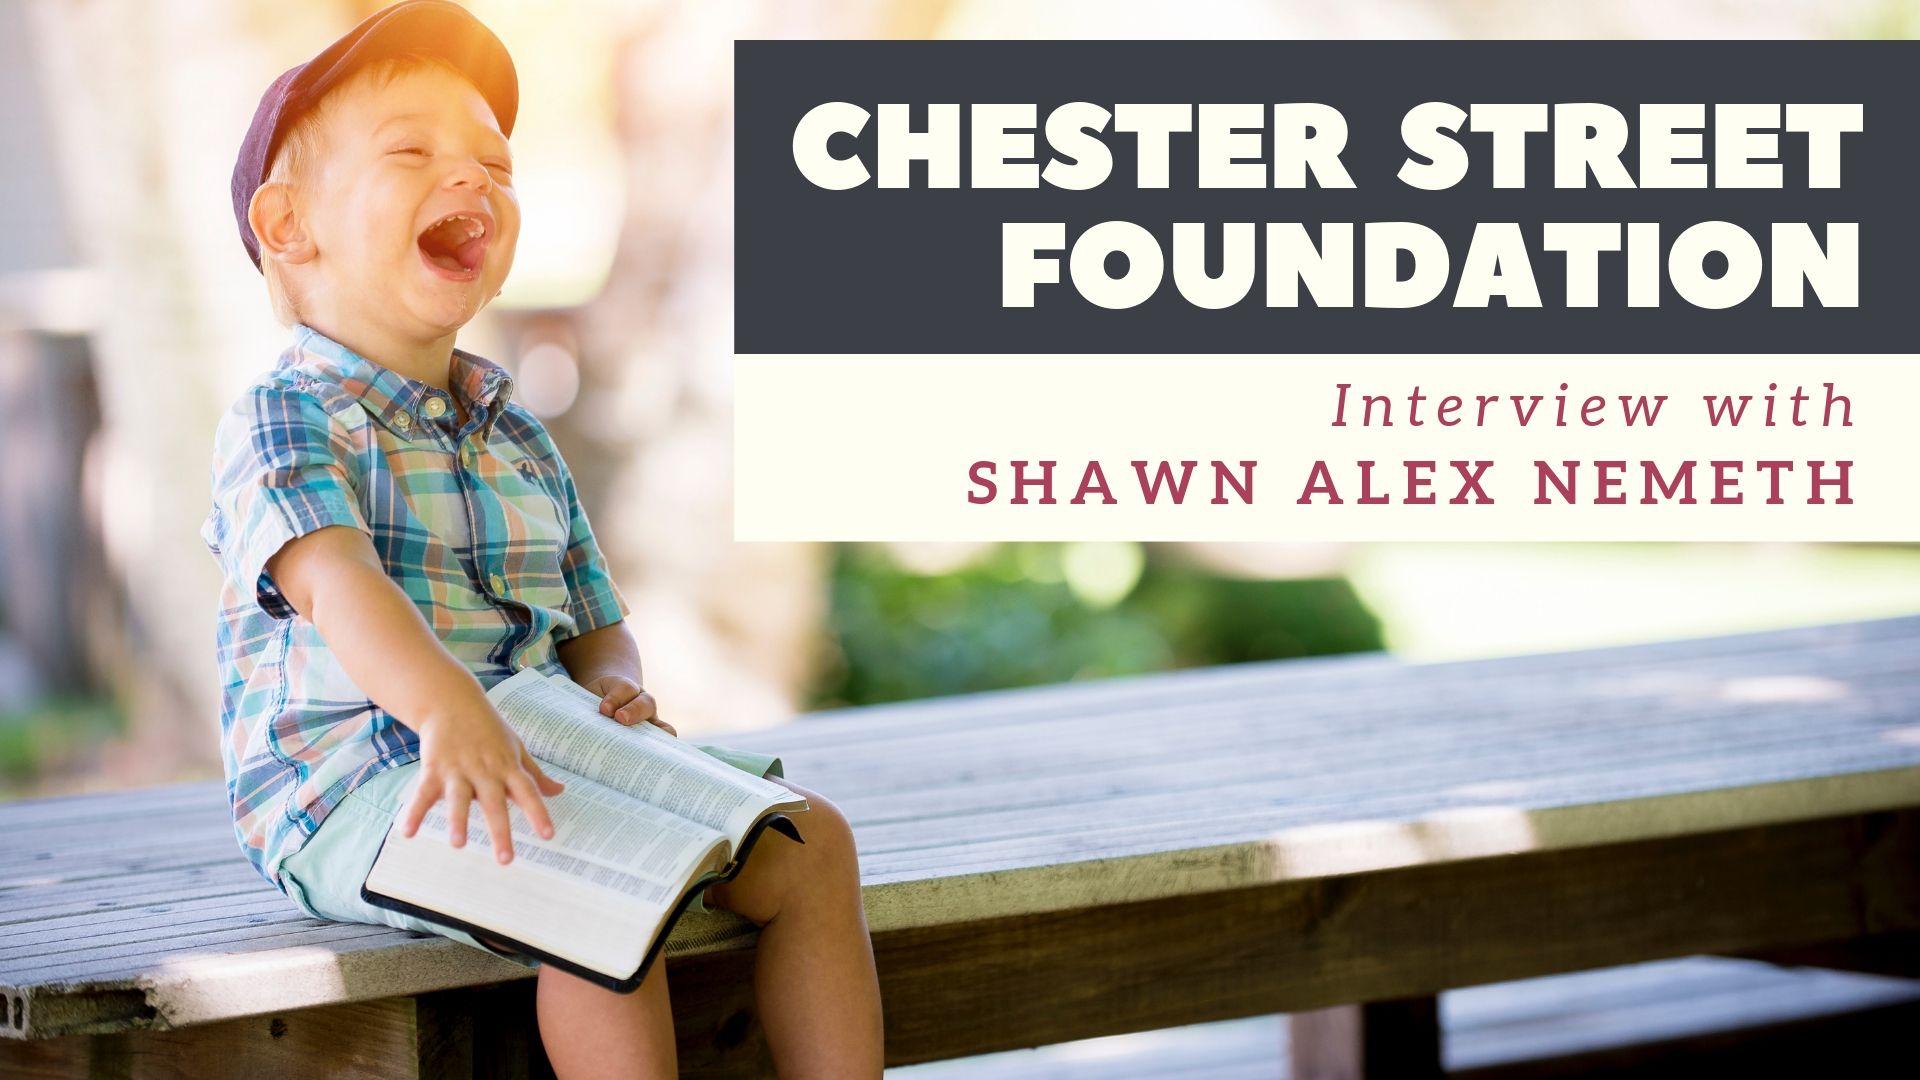 Chester Street Foundation shawn alex nemeth.jpg